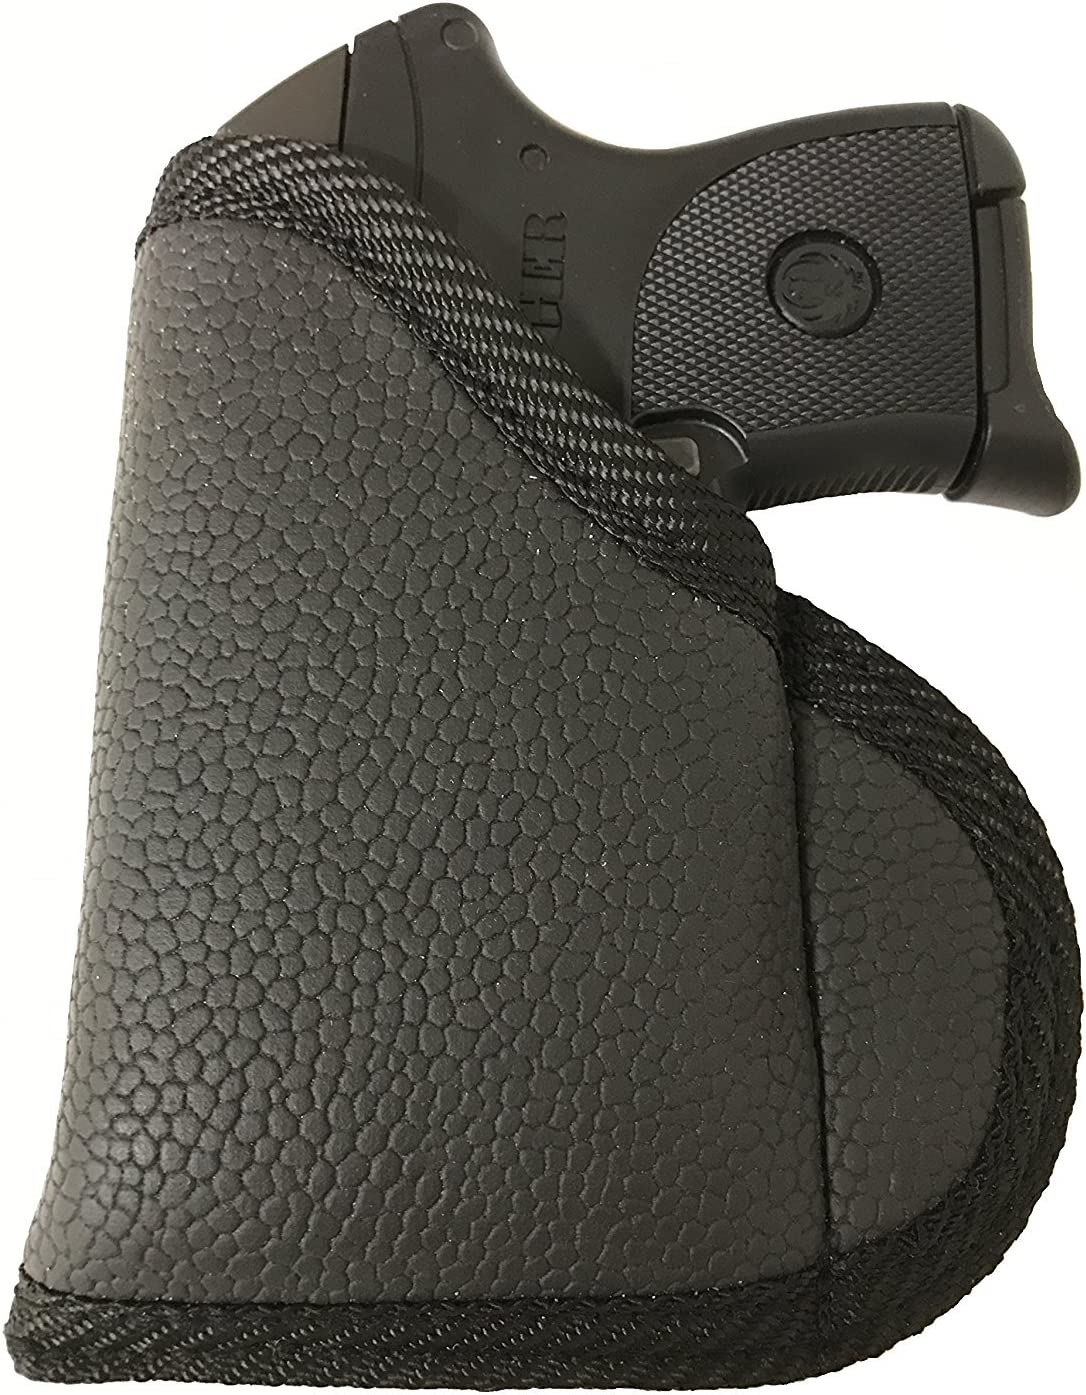 Protech Outdoors Gripper Inside Waistband Mail order Pocket Holster Gun Oklahoma City Mall or